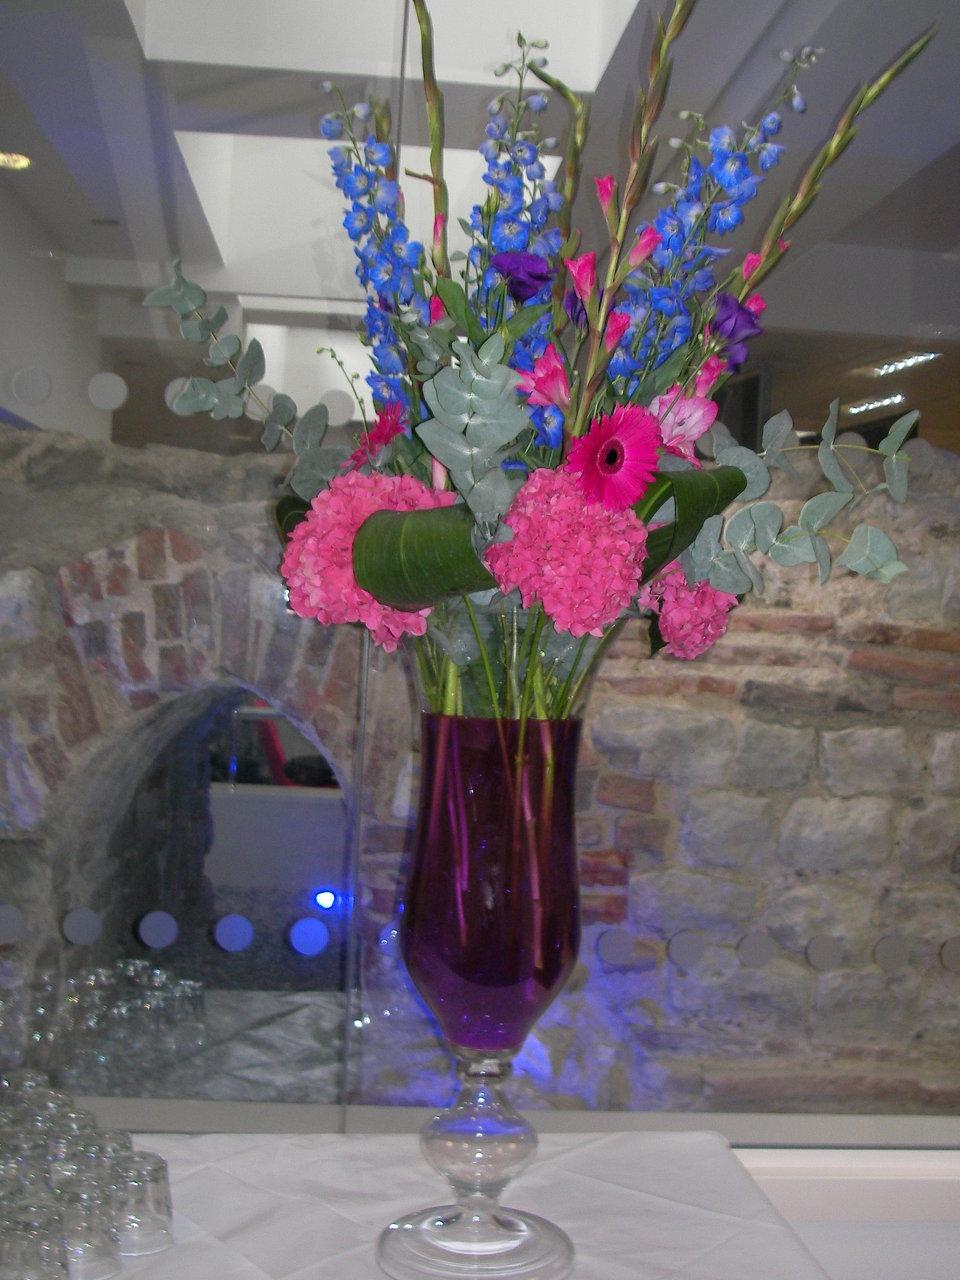 Hydrangeas and delphinium